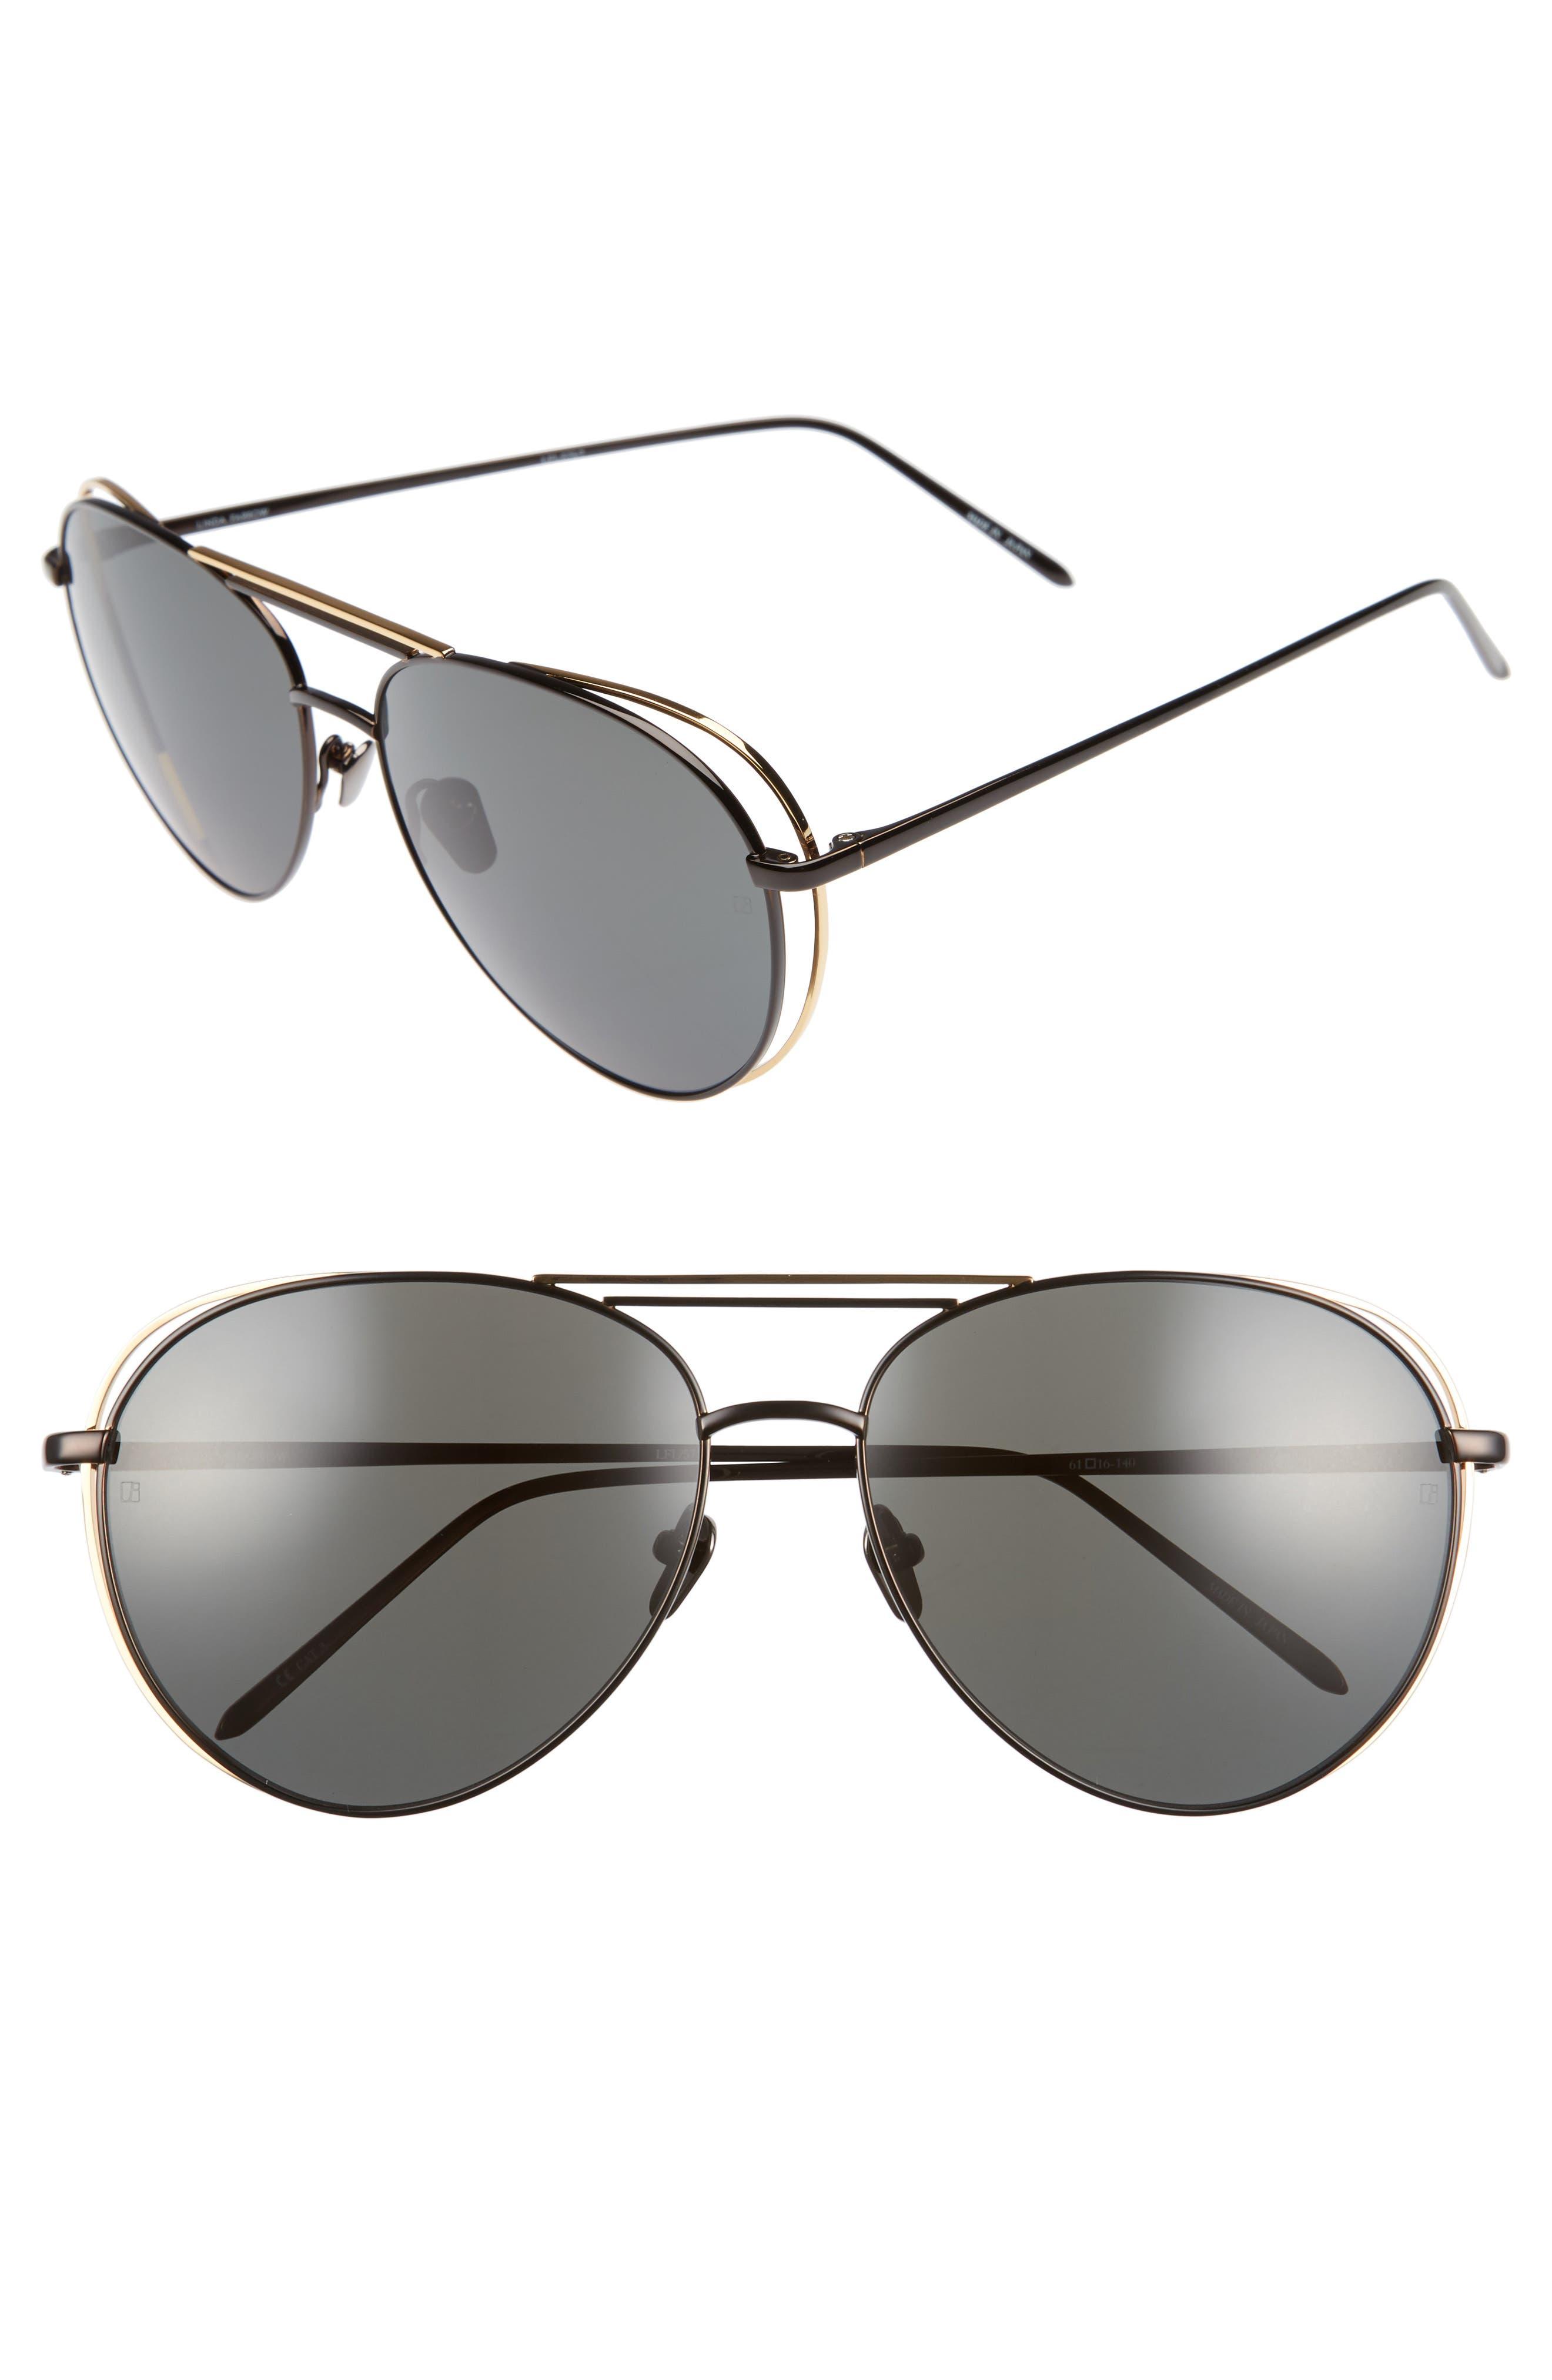 61mm 18 Karat Gold Aviator Sunglasses,                             Main thumbnail 1, color,